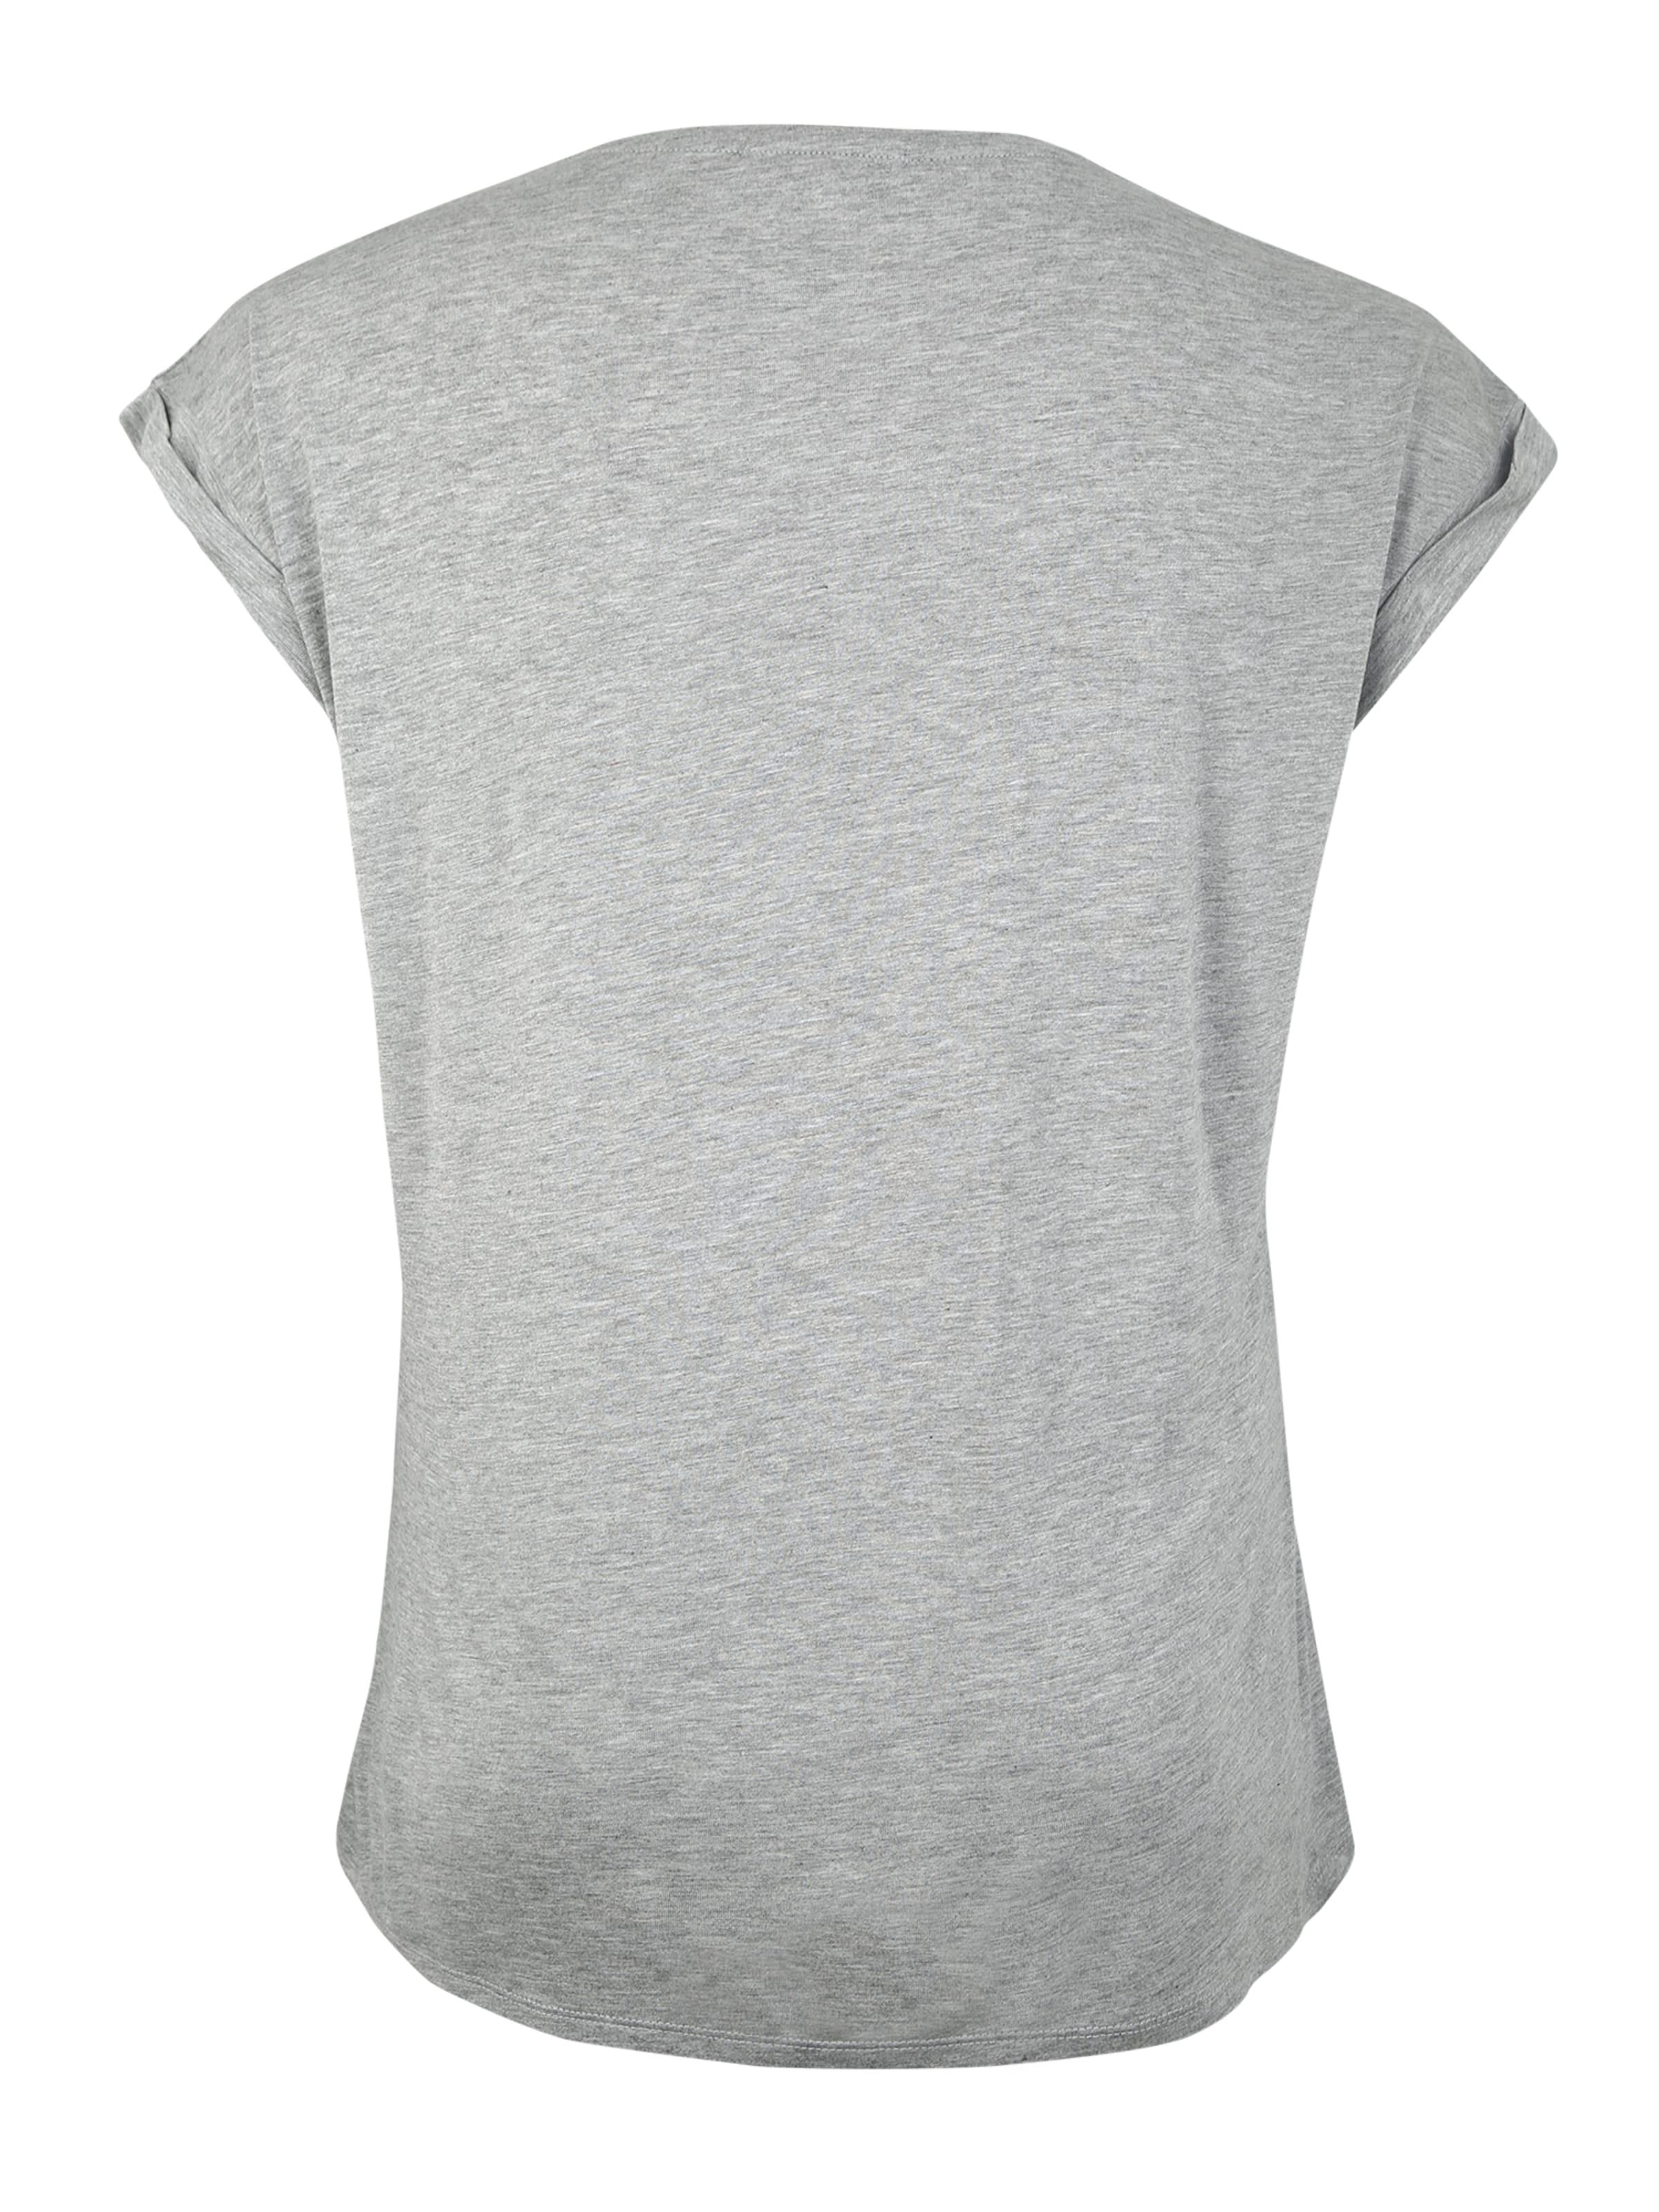 In About T shirt 'caja' Hellgrau You Curvy Rj3L4A5